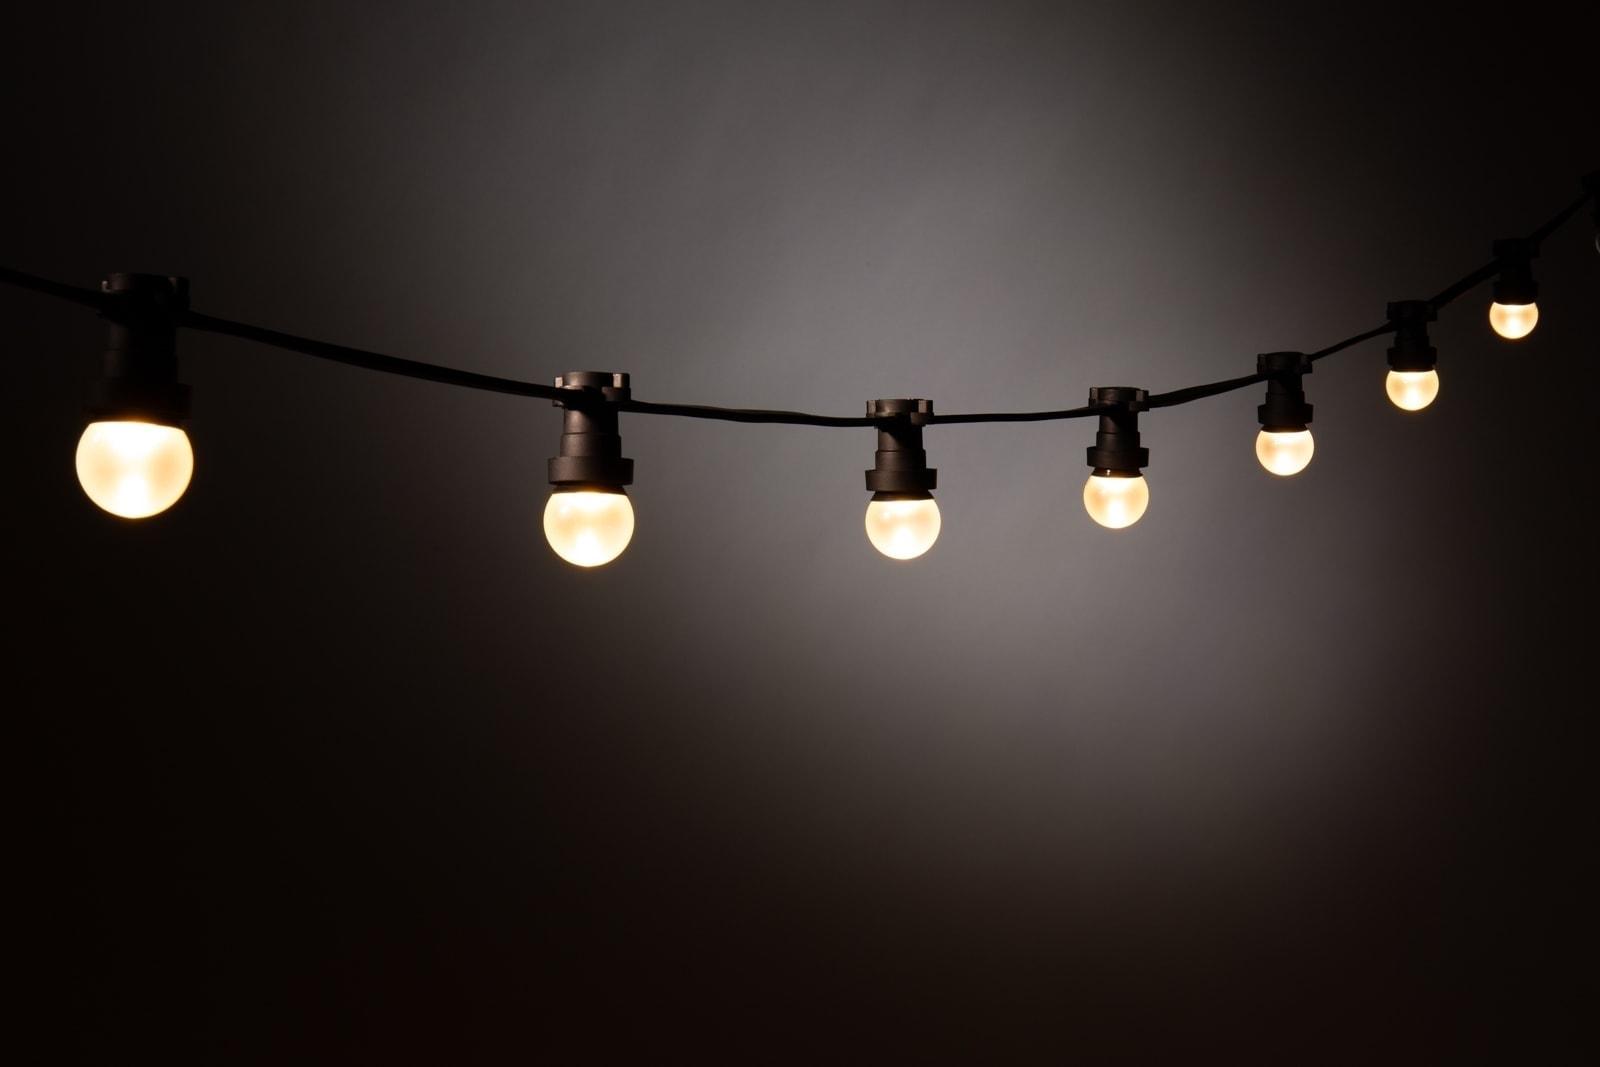 Prikkabel Led Lampen : Led prikkabel lampen warm wit u matte bol kerstverlichting buiten